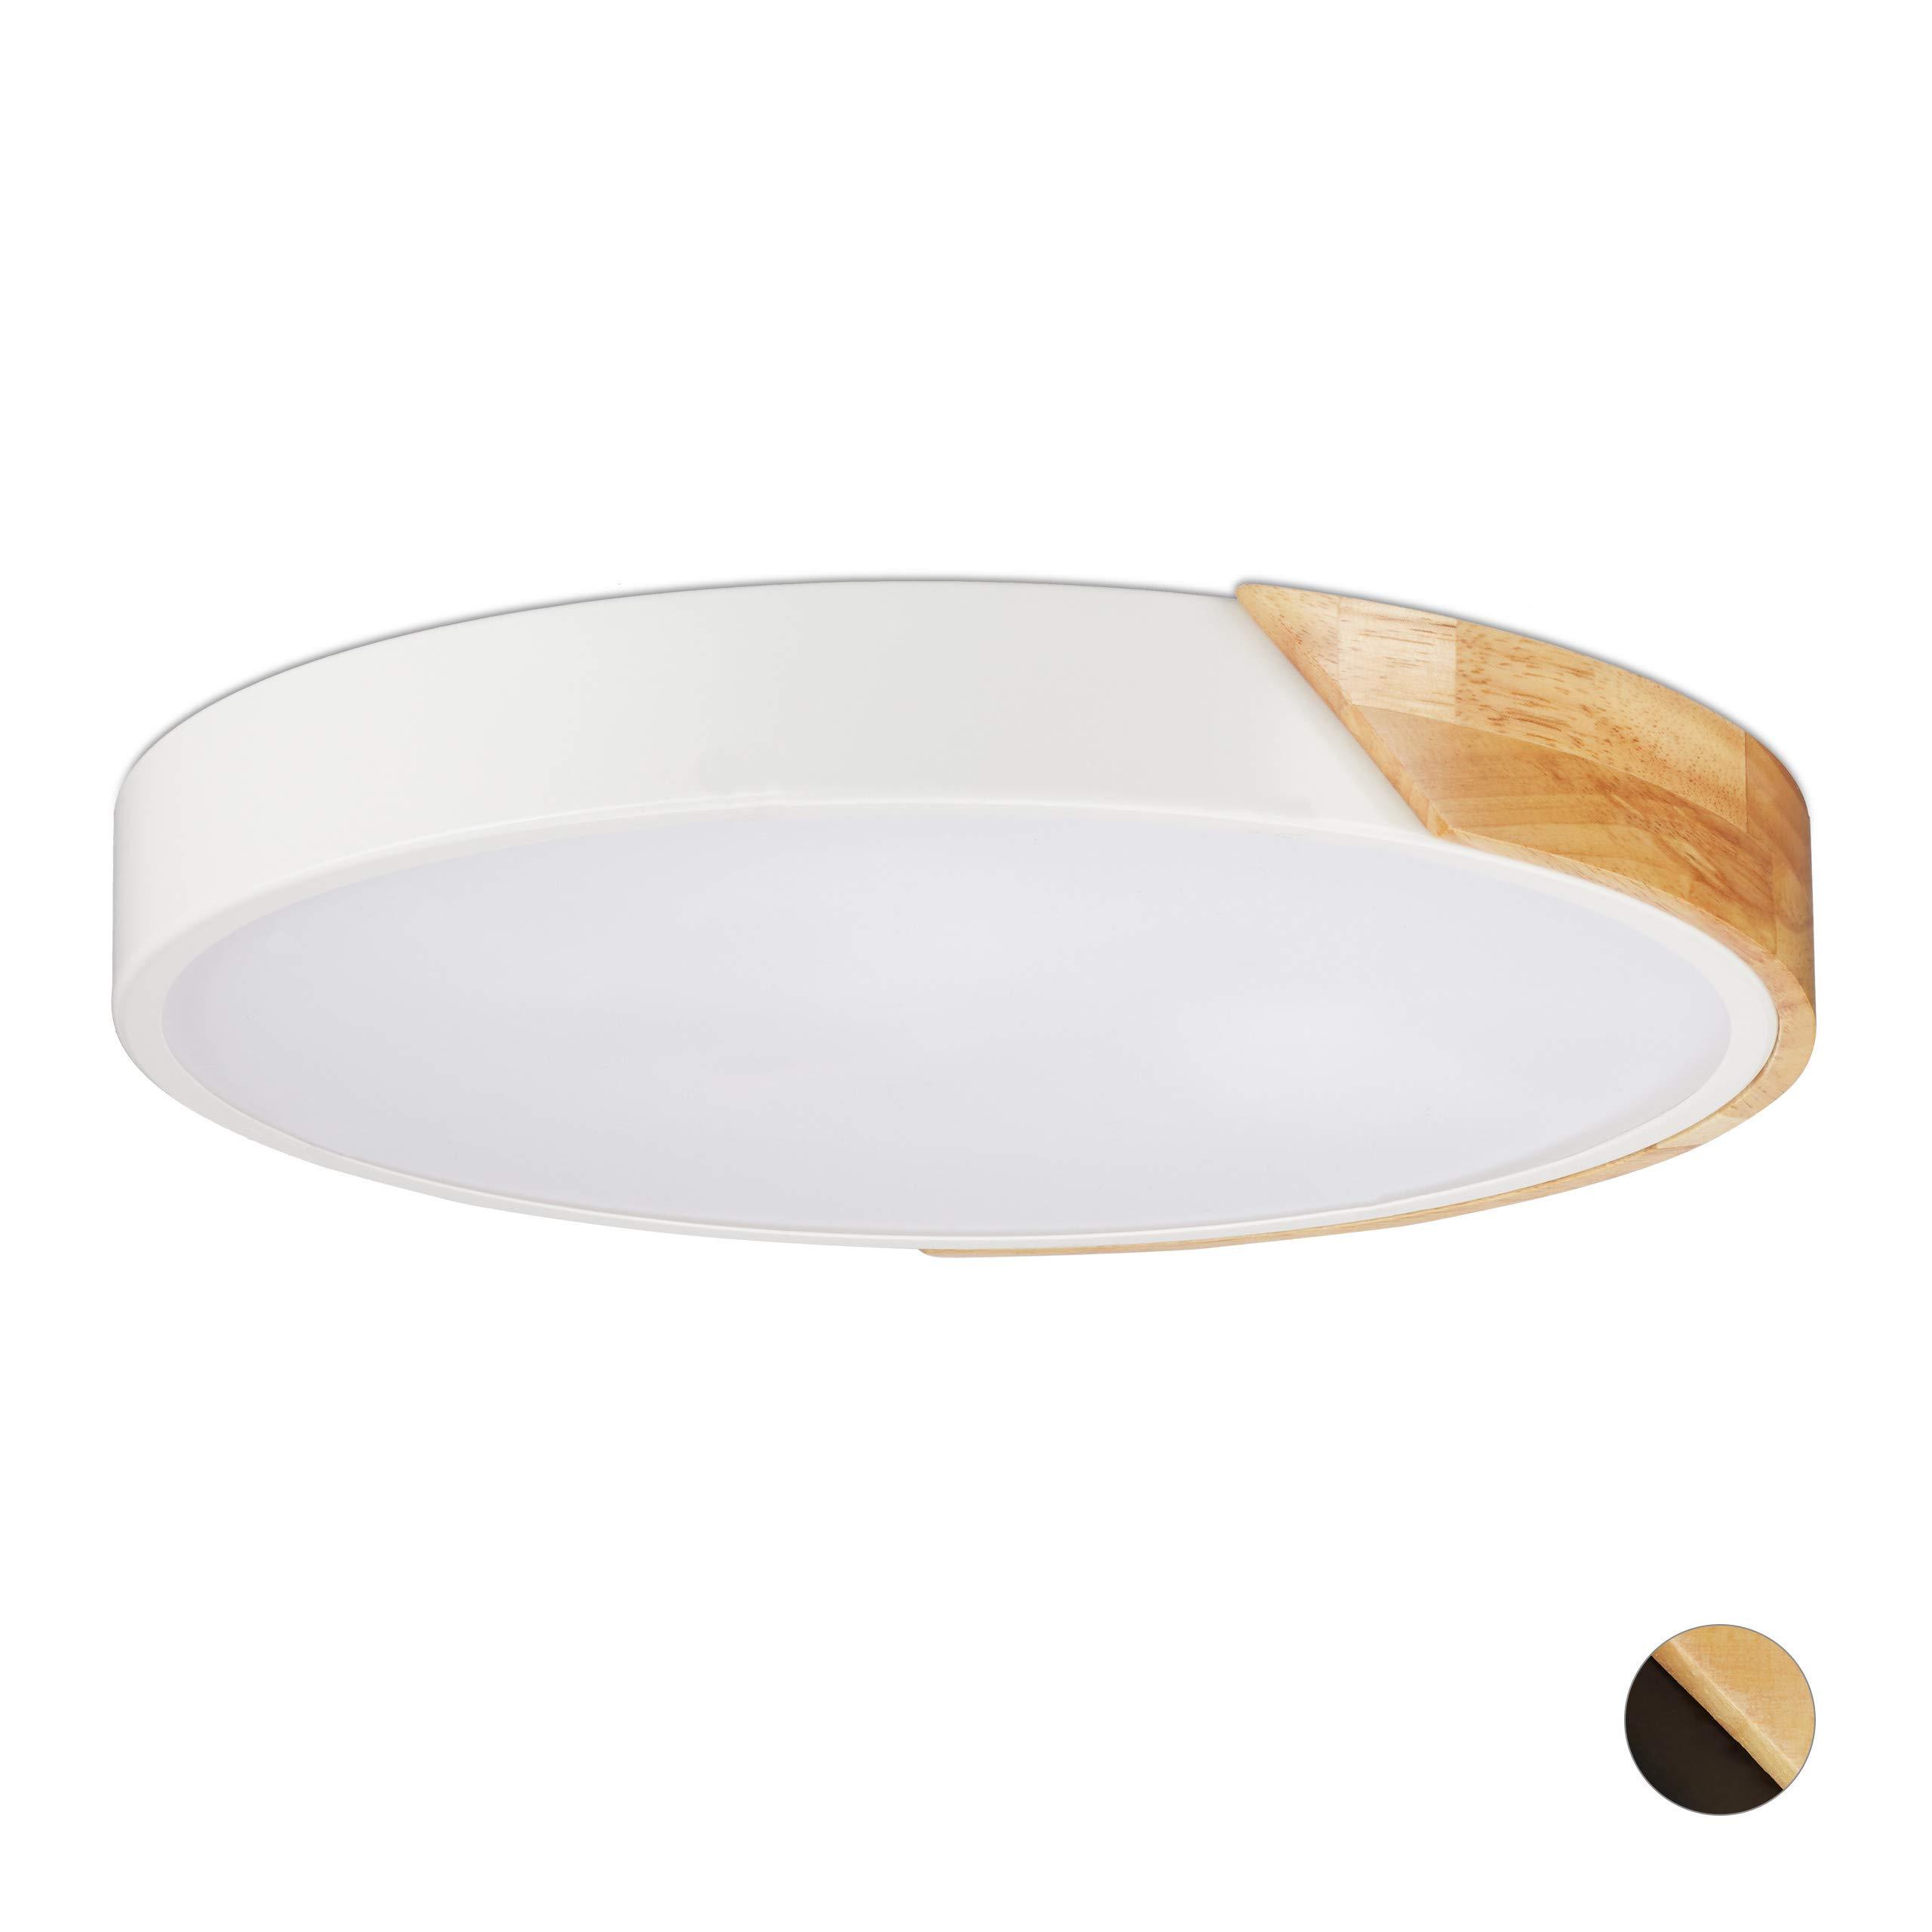 Relaxdays 吊灯,24 瓦 LED 走廊,圆形木和金属照明灯具 白色 L 10025171_49